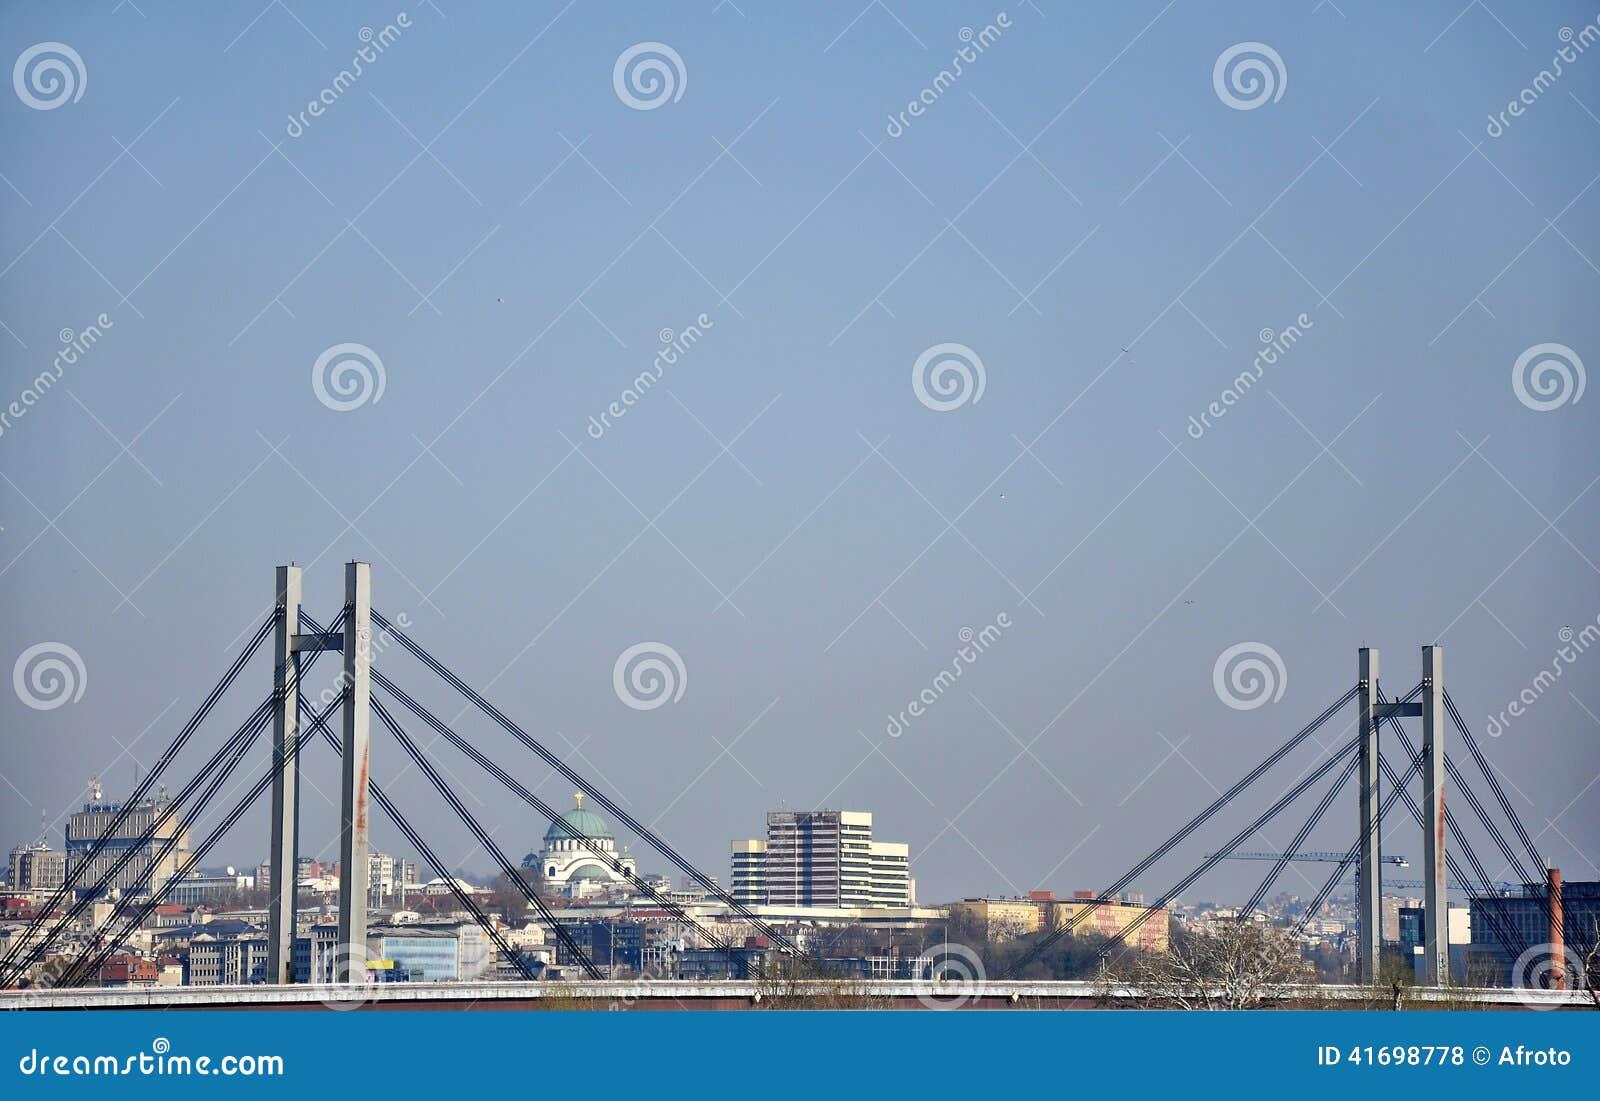 Brug in de grote stad van Belgrado